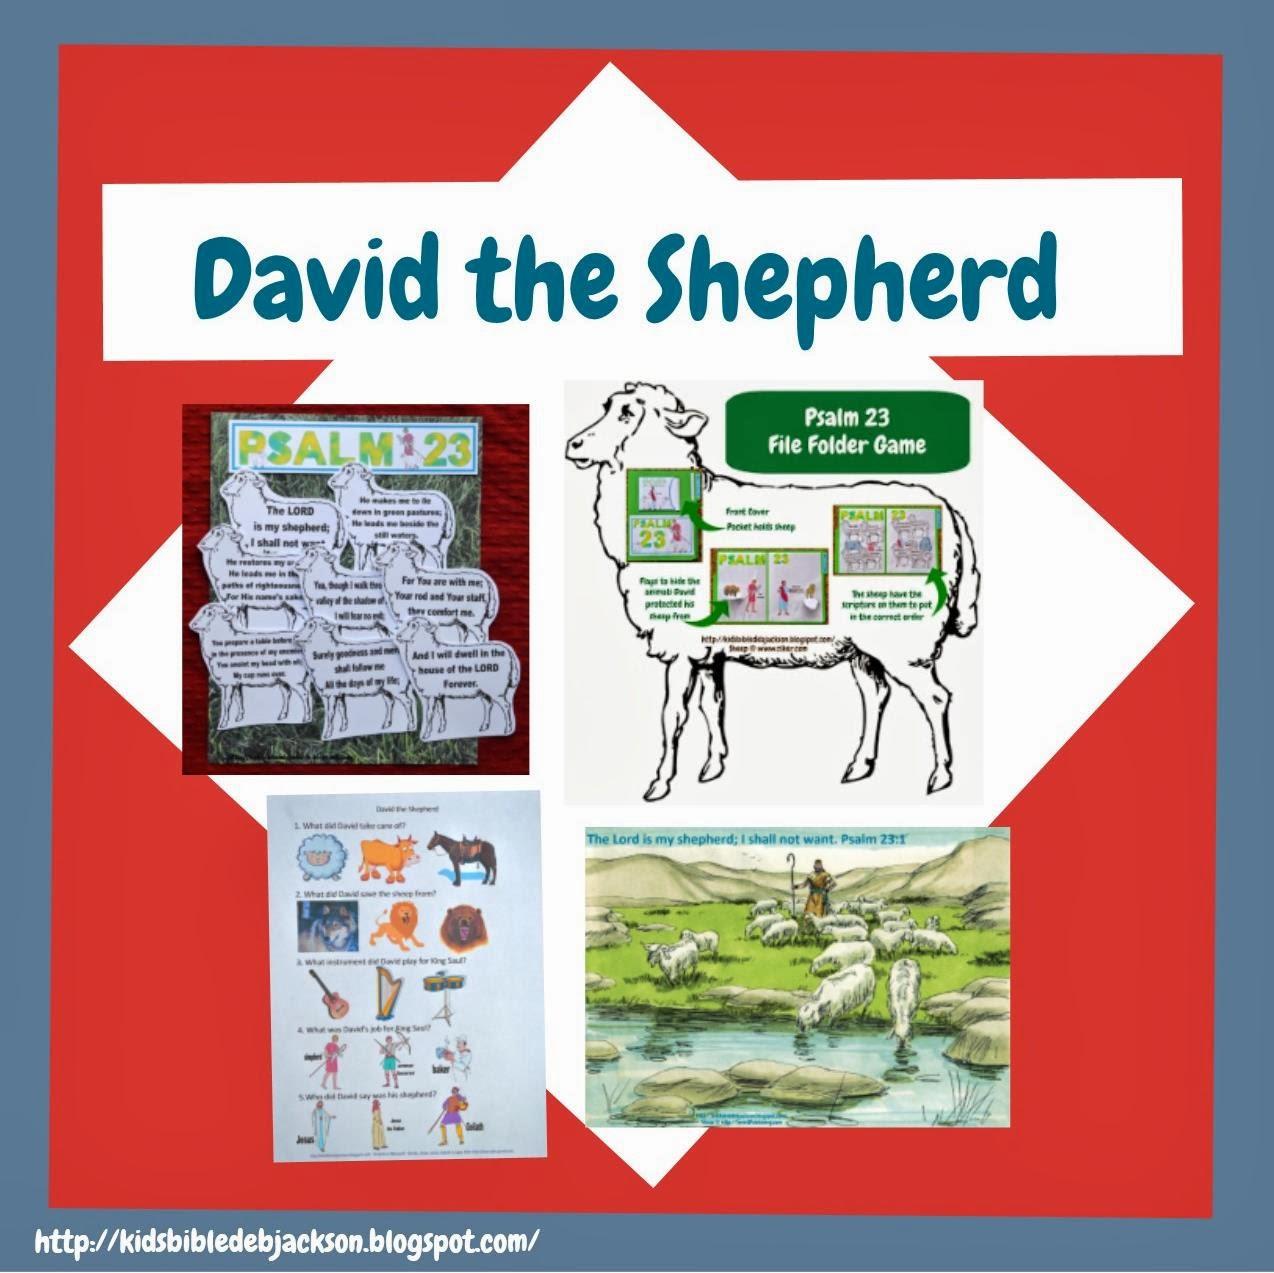 http://kidsbibledebjackson.blogspot.com/2014/02/david-shepherd-saul-is-made-king.html